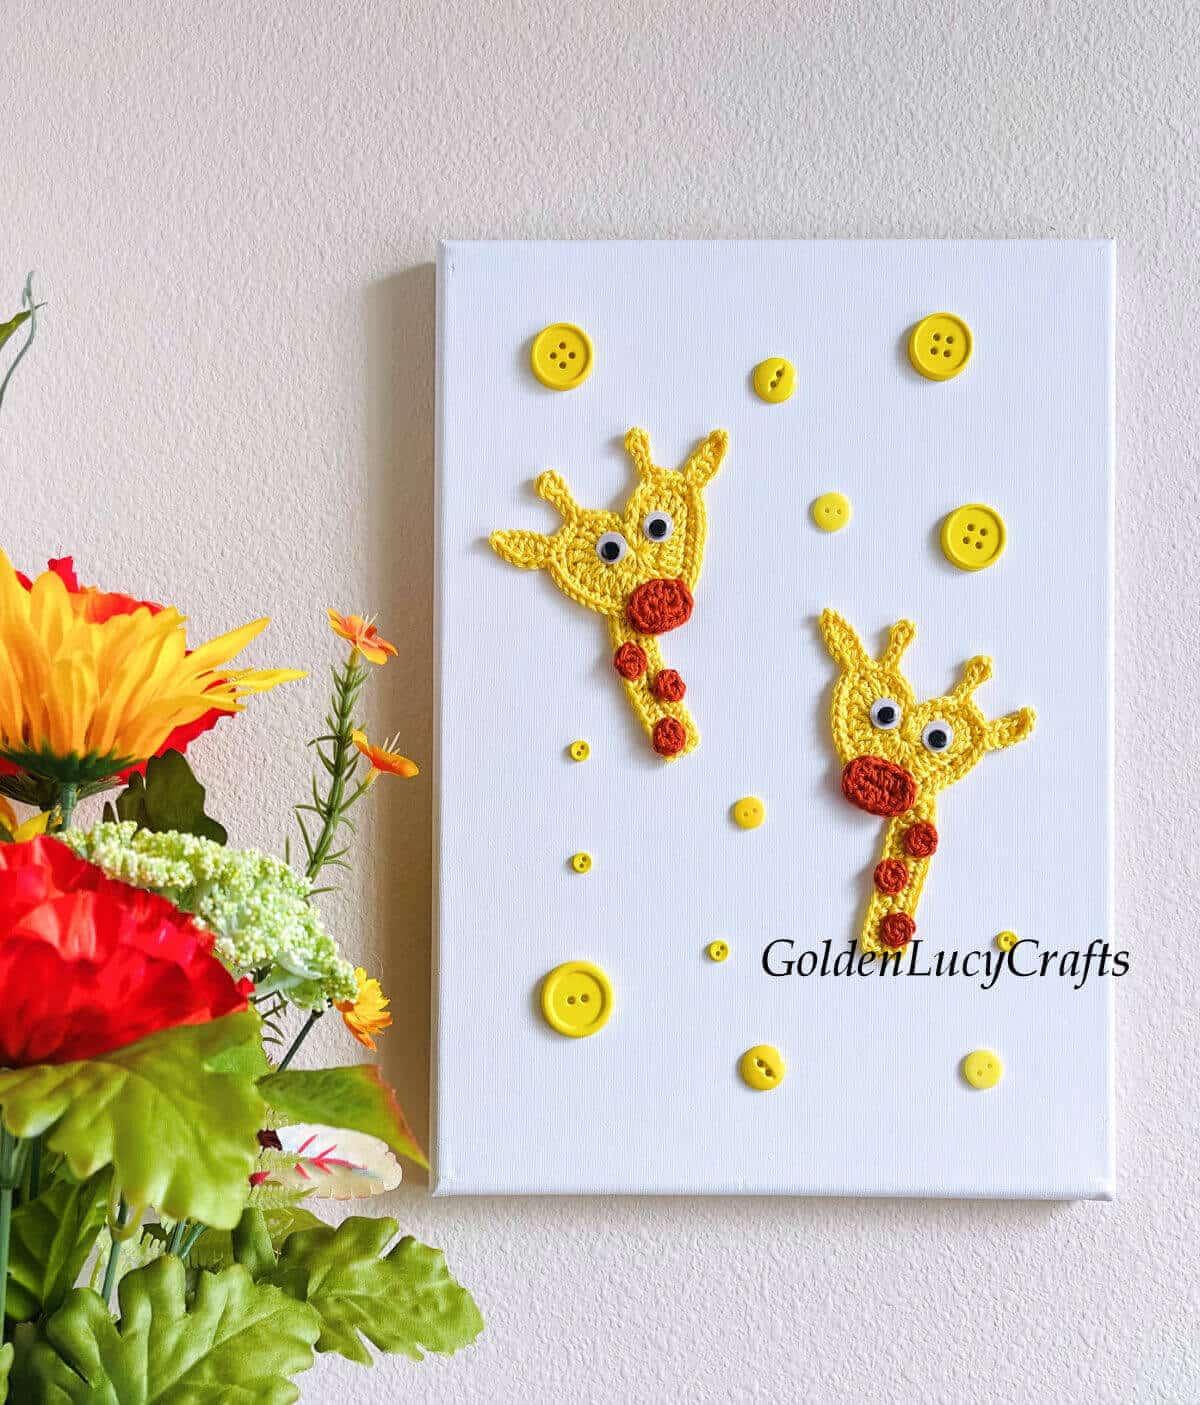 Crocheted giraffe wall decor, flowers next to it.